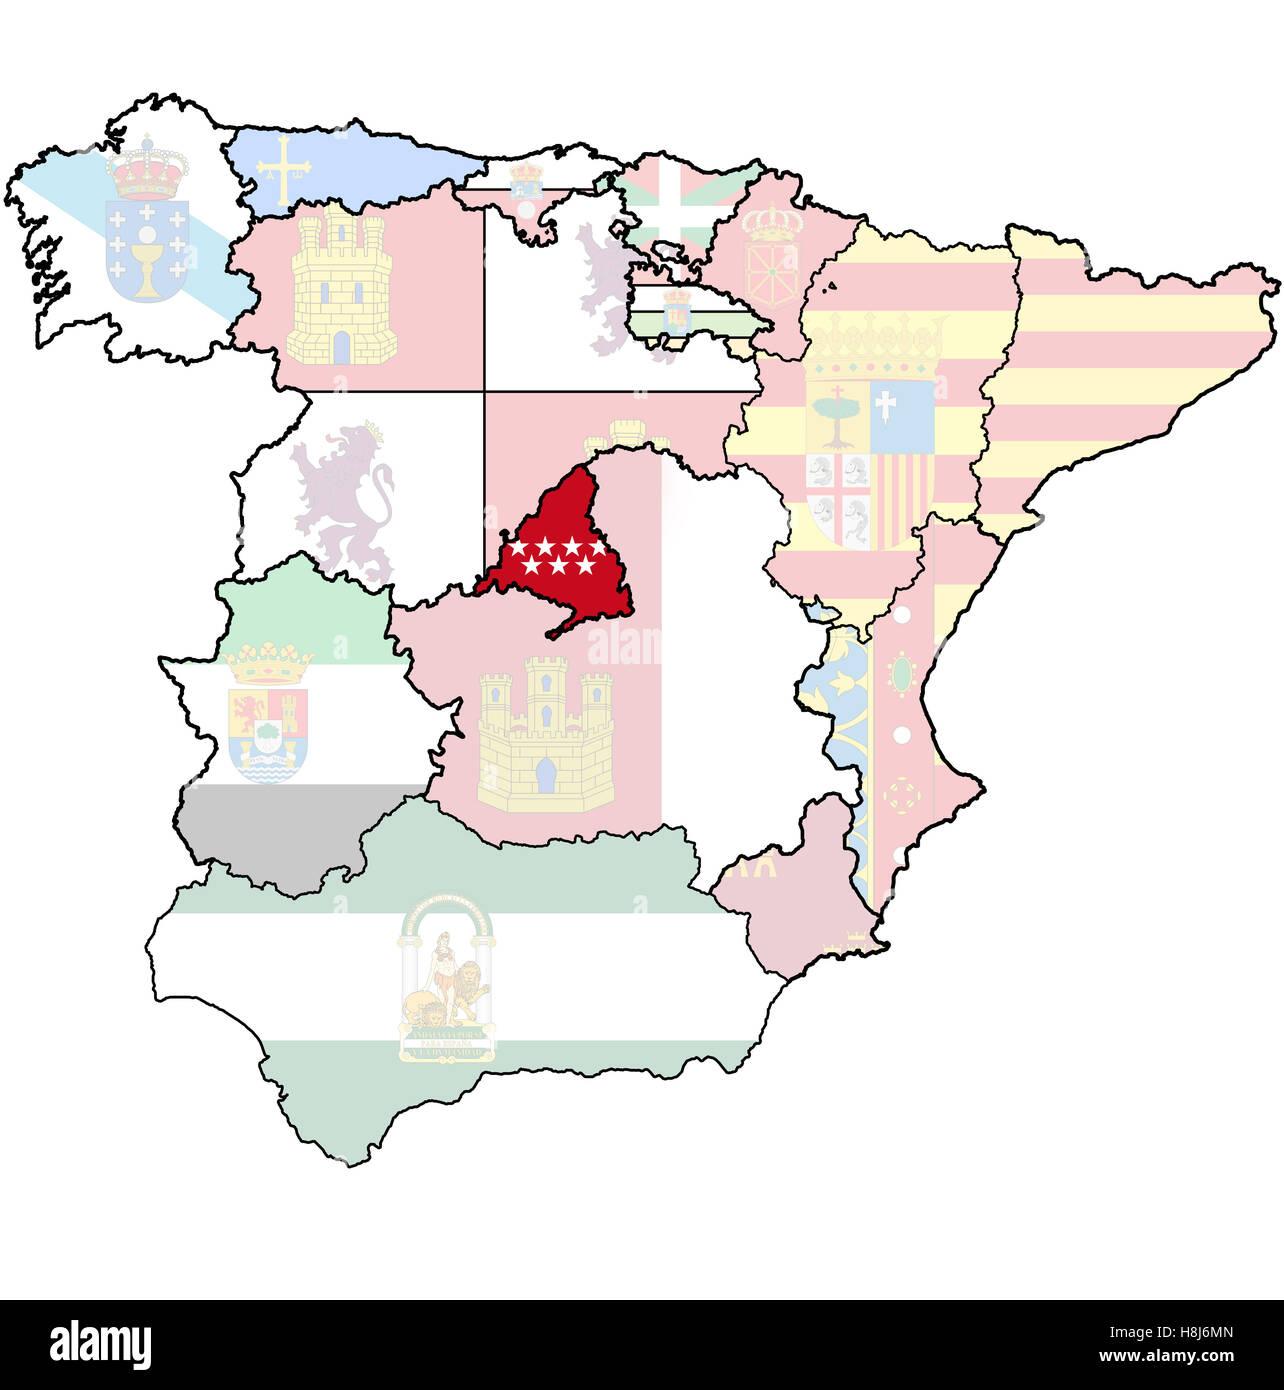 community of madrid region on administration map of regions of spain ...